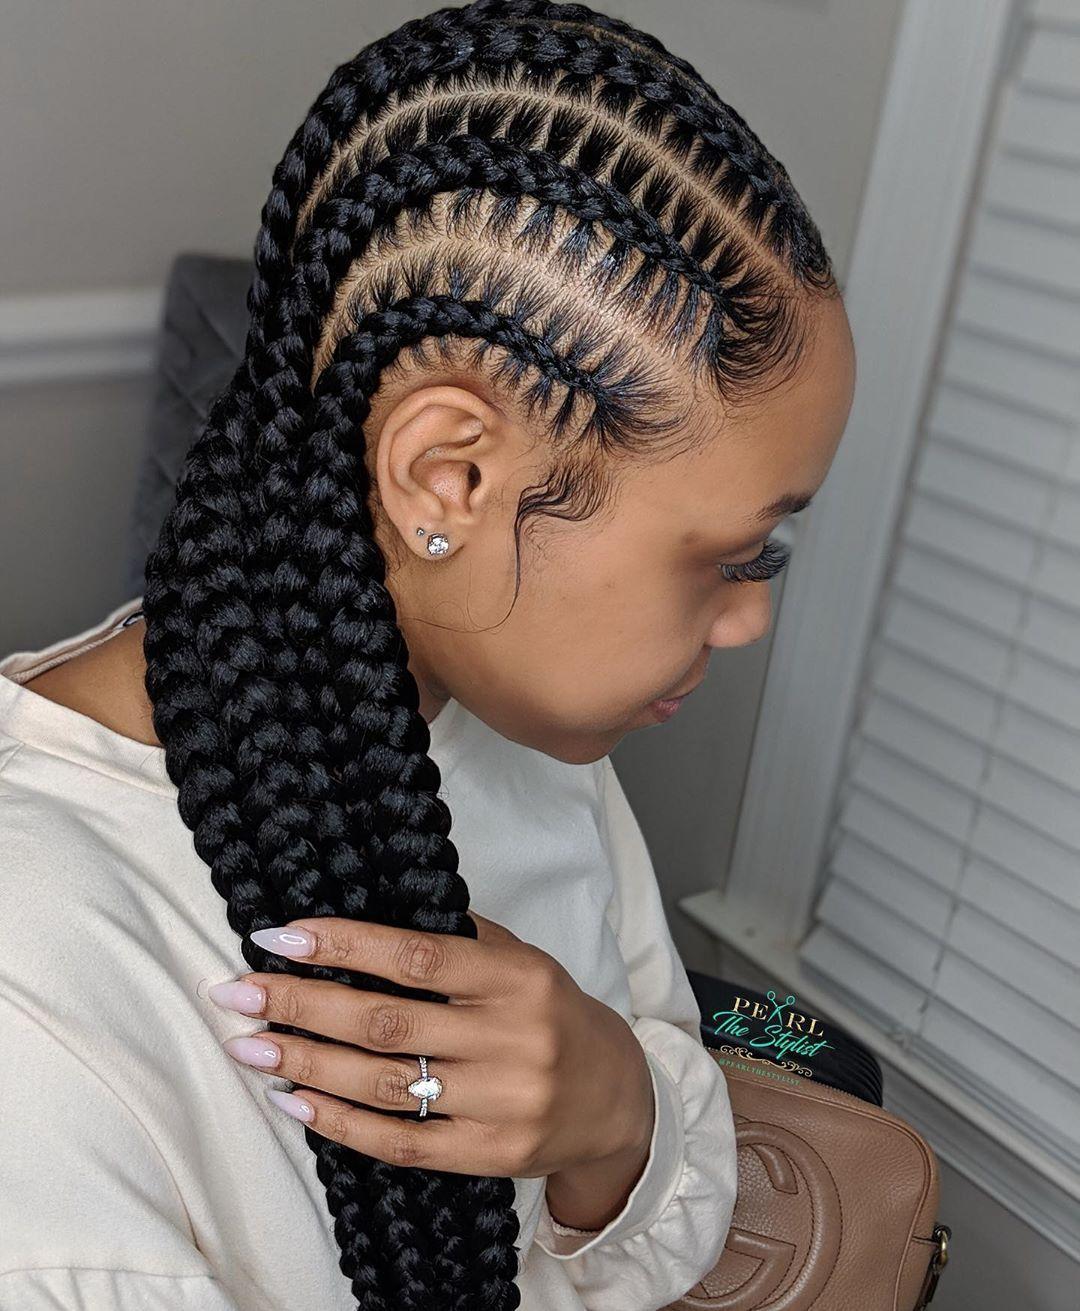 Conrows Braids History Cornrow Hairstyles Hair Styles Feed In Braids Hairstyles